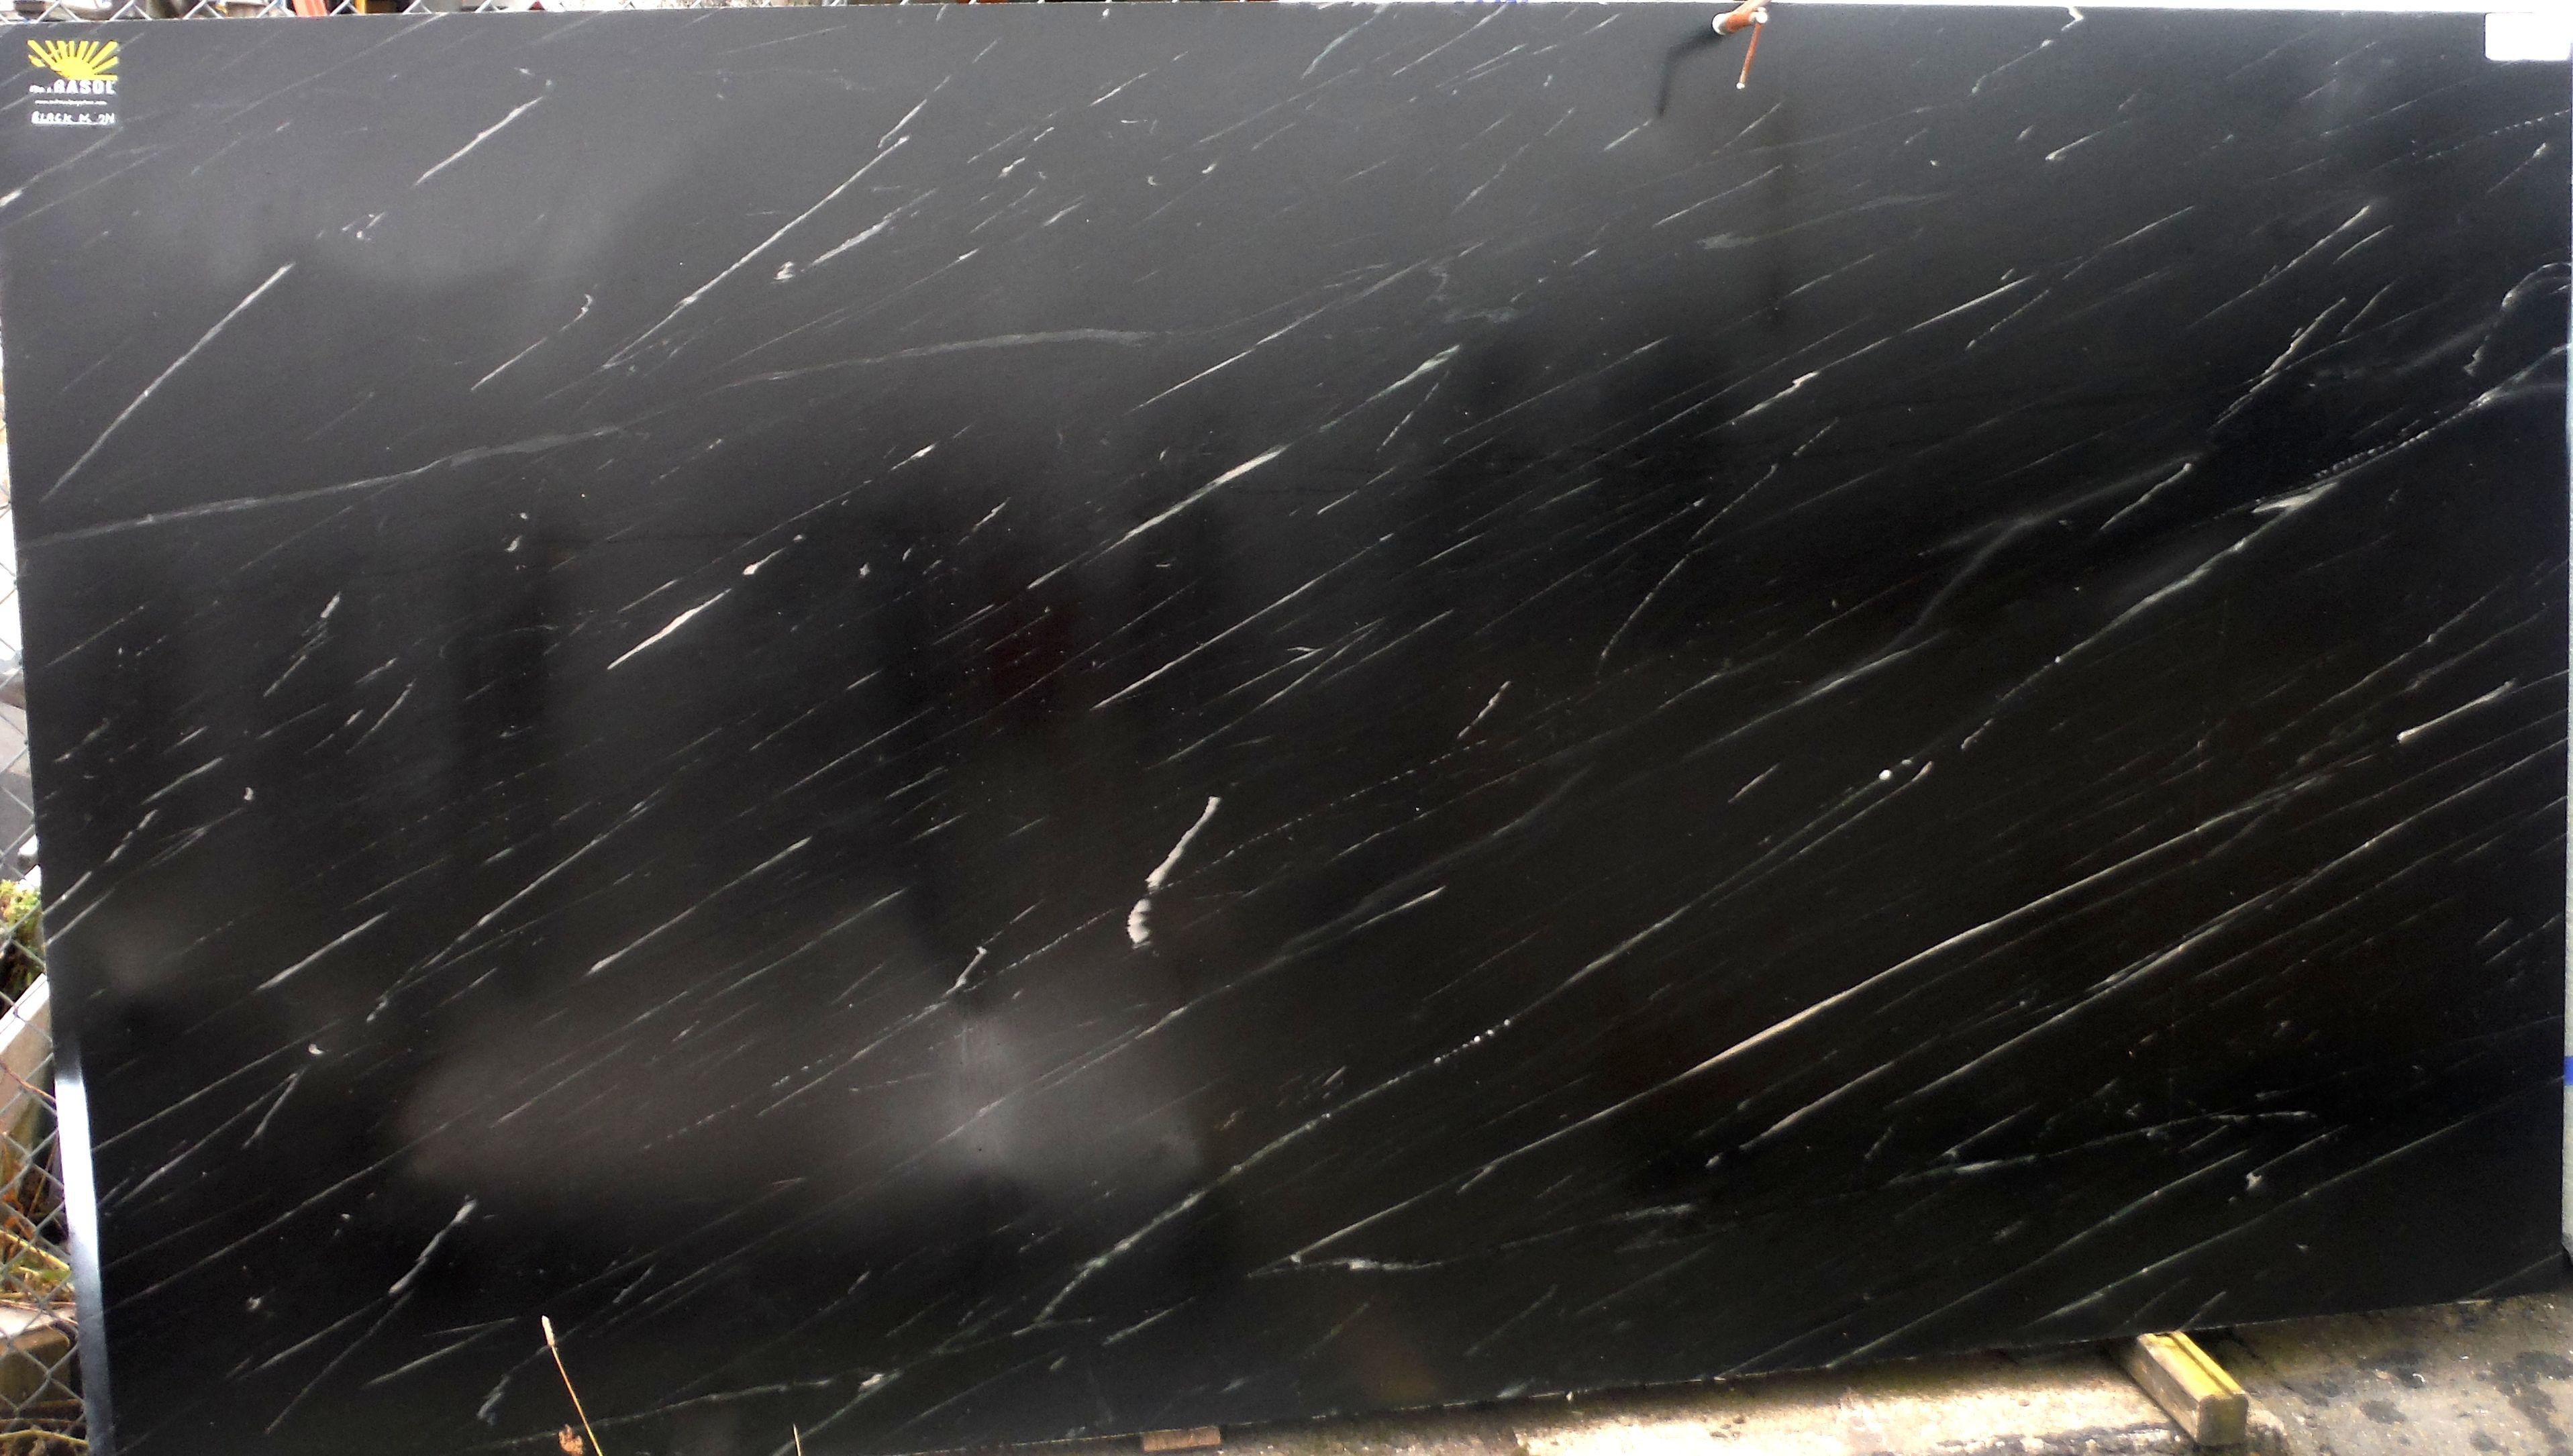 BLACK MOON SOAPSTONE SLAB (OILED) | Soapstone | Pinterest ... on marble slabs, basalt slabs, salt slabs, chalcedony slabs, limestone slabs, red slabs, brick slabs, travertine slabs, amethyst slabs, gold slabs, walrus tusk slabs, selenite slabs, rock slabs, amazonite slabs, honed onyx slabs, slate slabs, quartzite slabs, porcelain slabs, clay slabs, stone slabs,